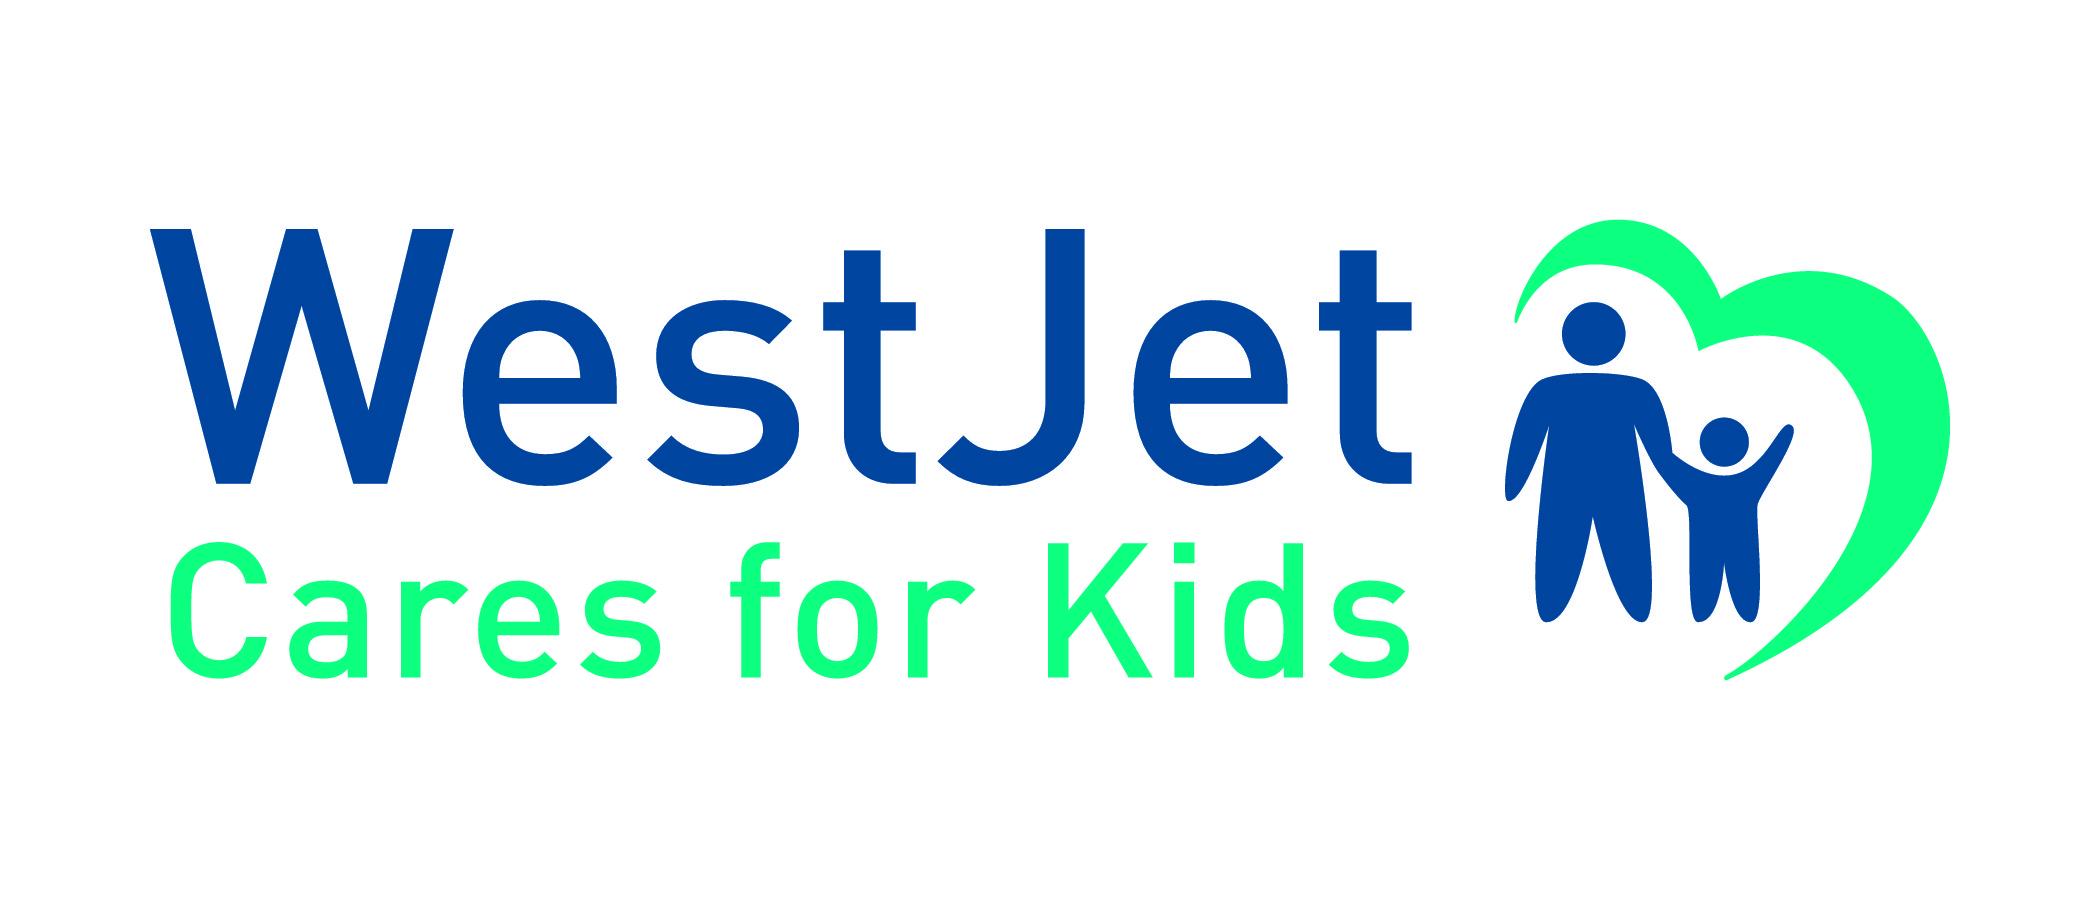 Westjet Work From Home